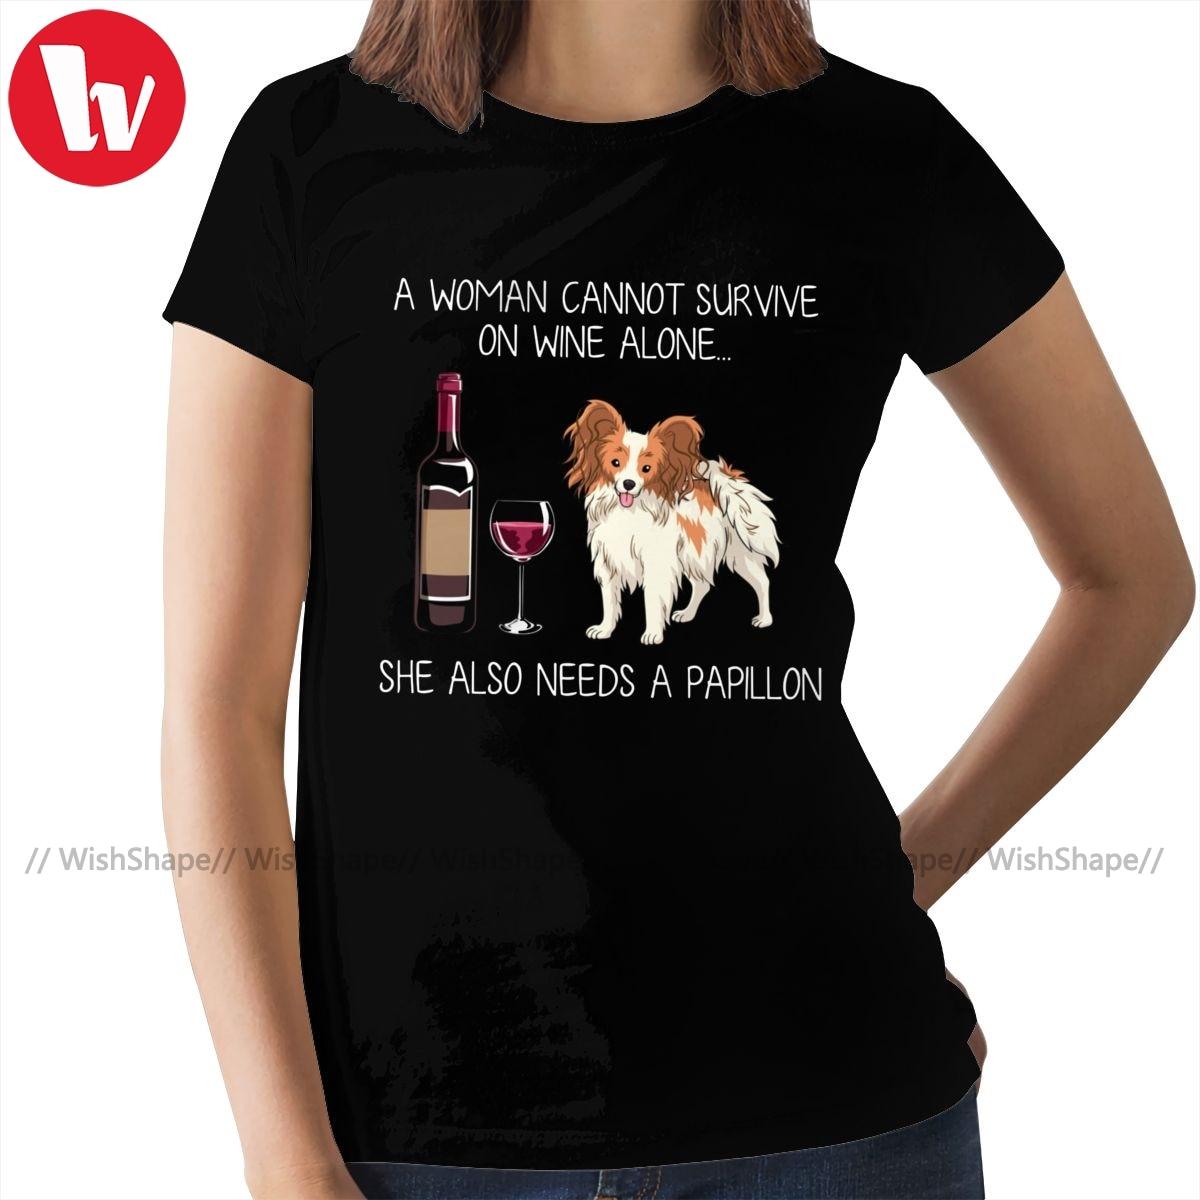 Papillon Dog T-Shirt Papillon And Wine T Shirt Print Short Sleeve Women tshirt 100 Cotton Ladies Tee Shirt